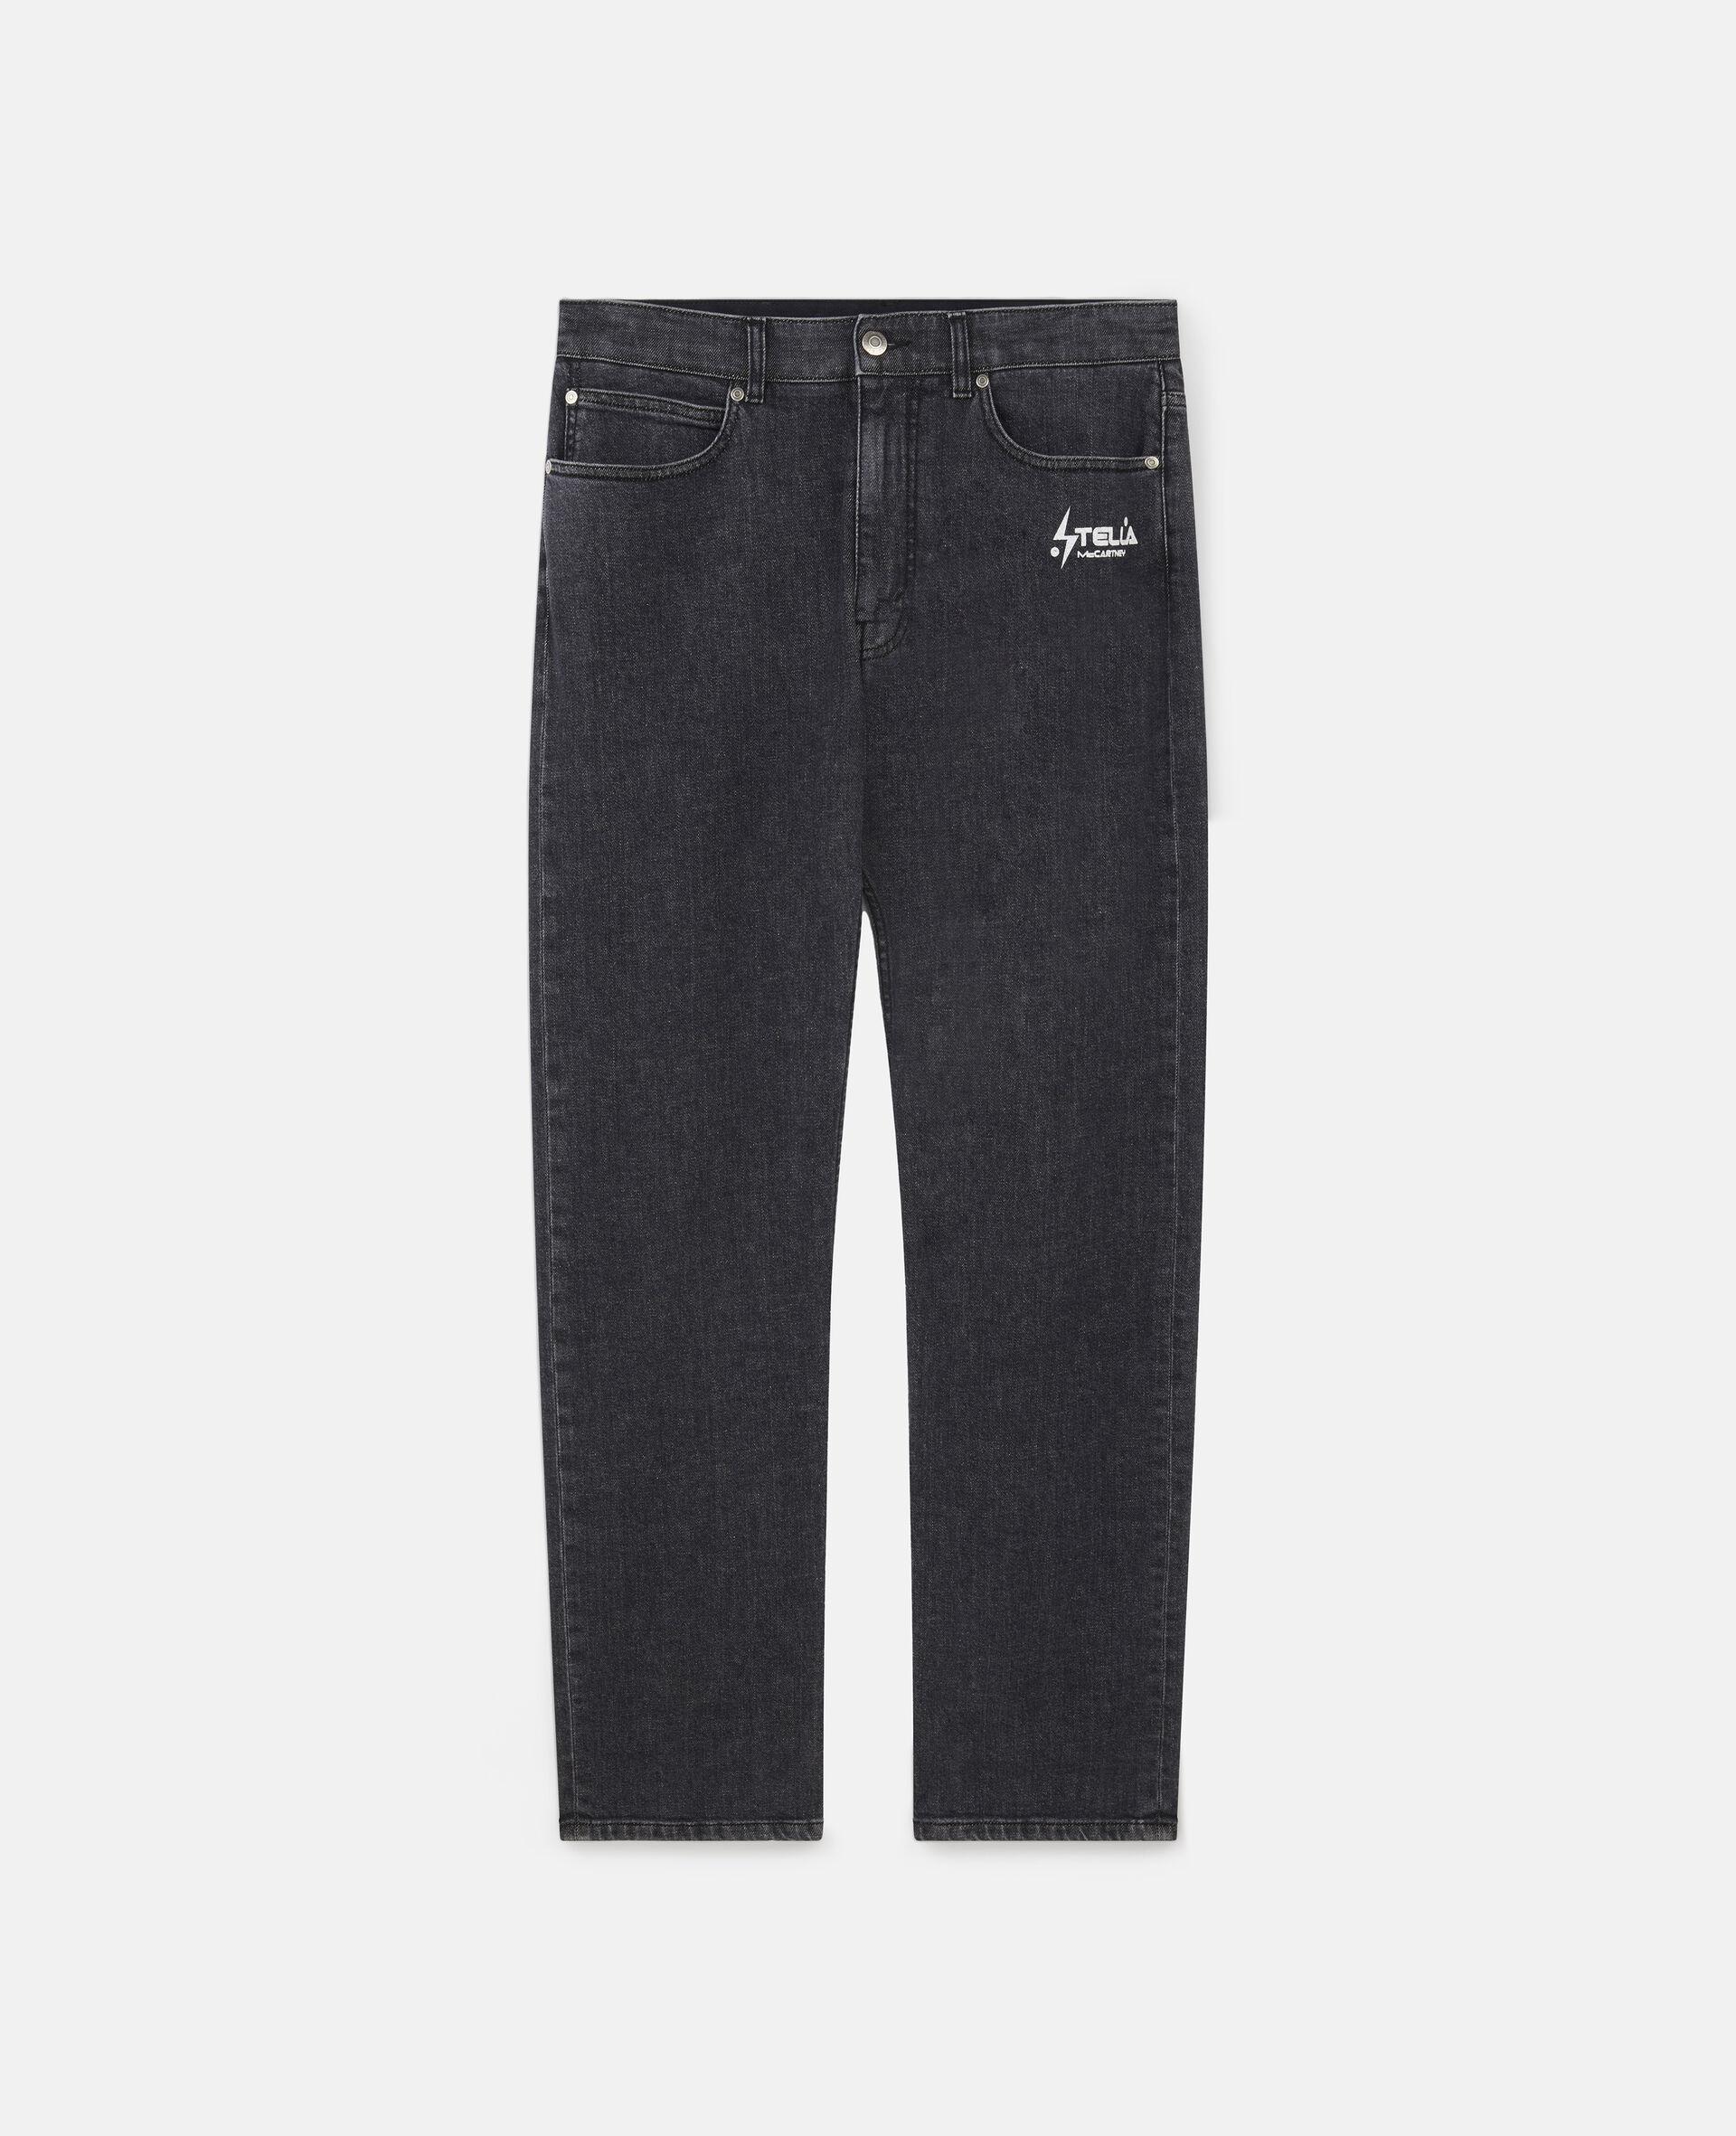 Jeans in Denim con Logo Stella Tom Tosseyn-Nero-large image number 0